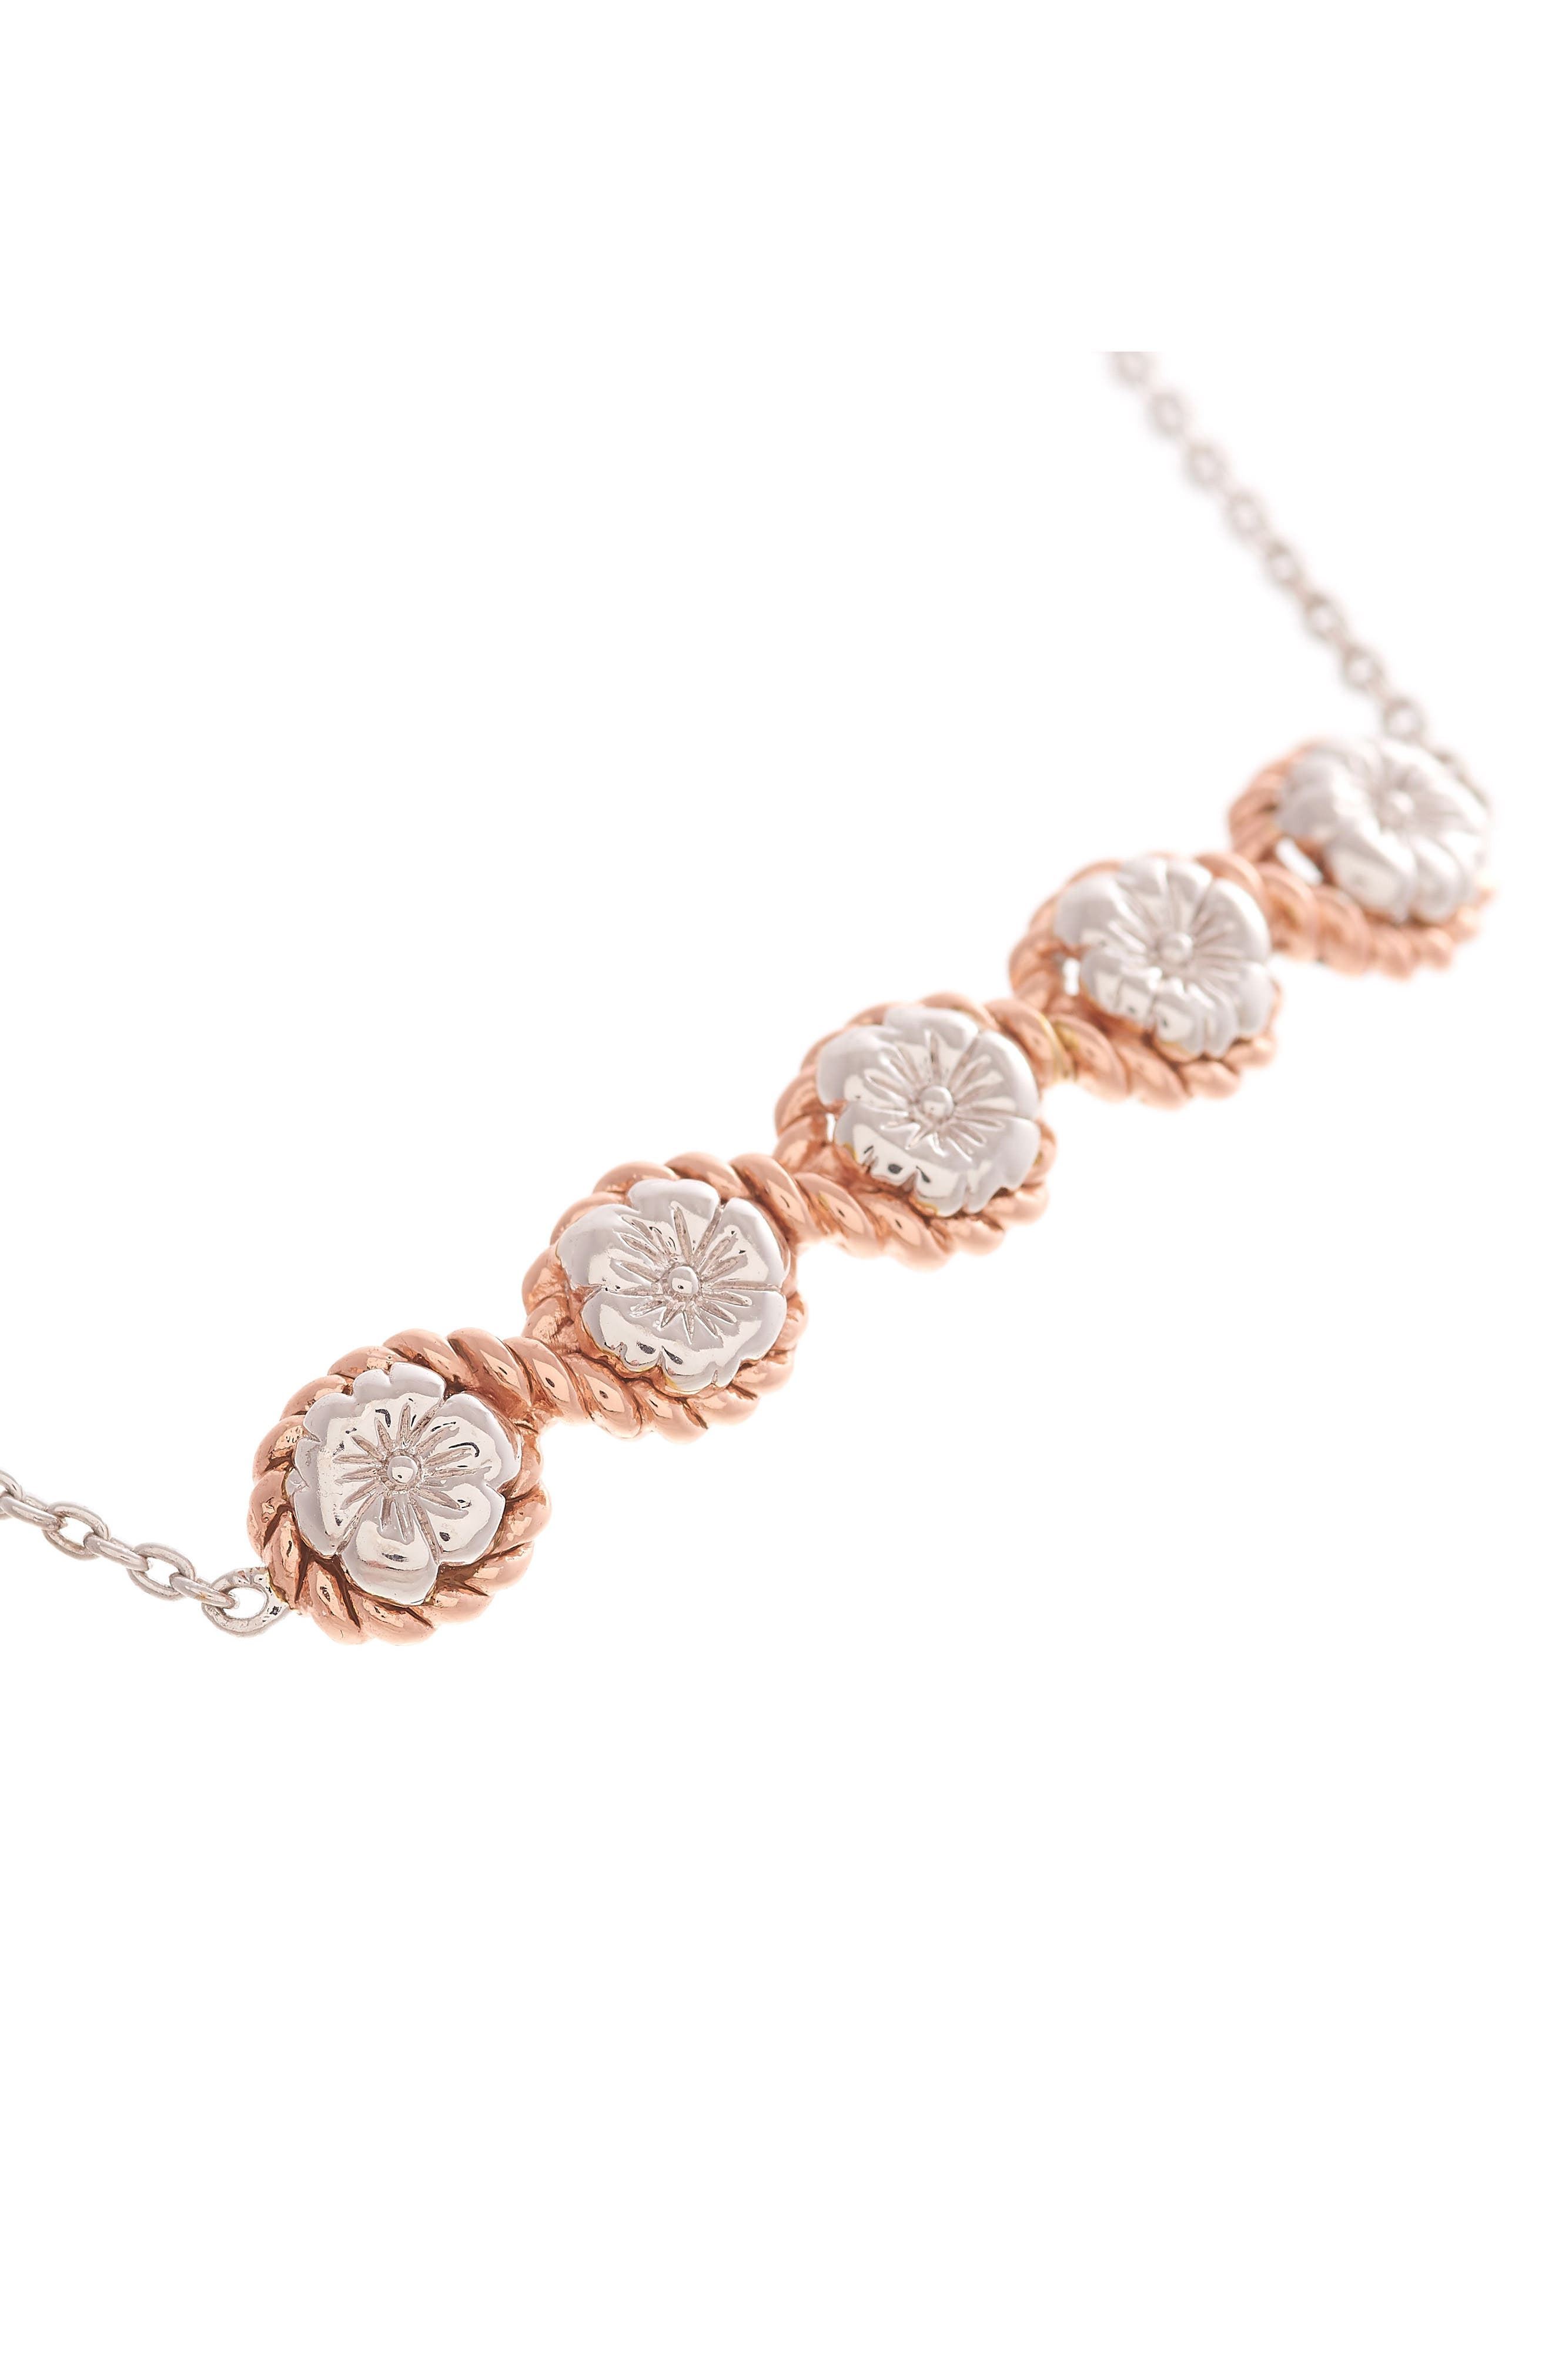 Flower Show Rope Chain Bracelet,                             Alternate thumbnail 2, color,                             Silver / Rose Gold